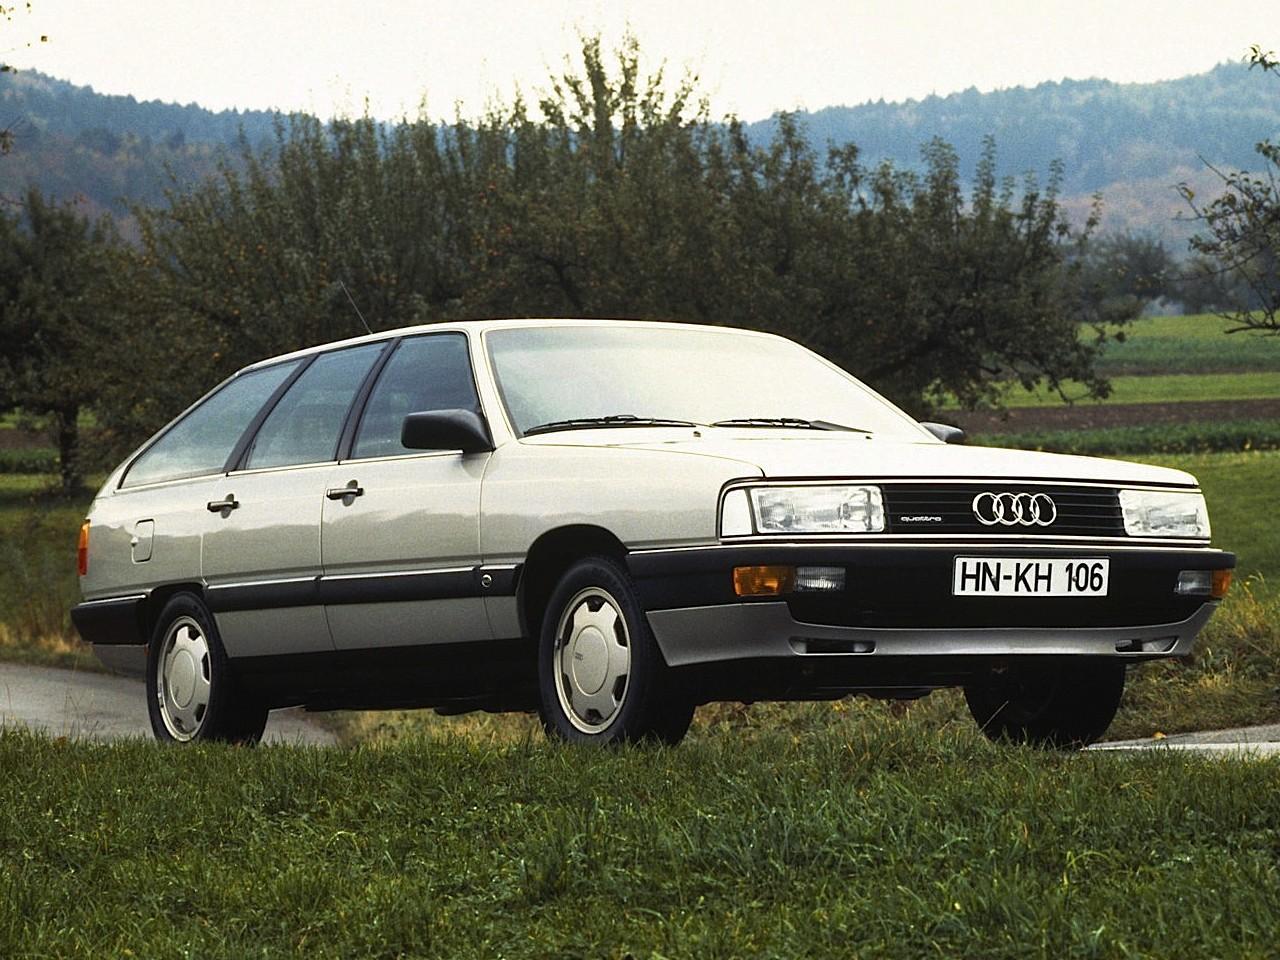 AUDI 200 Avant specs & photos - 1985, 1986, 1987, 1988, 1989, 1990, 1991 - autoevolution